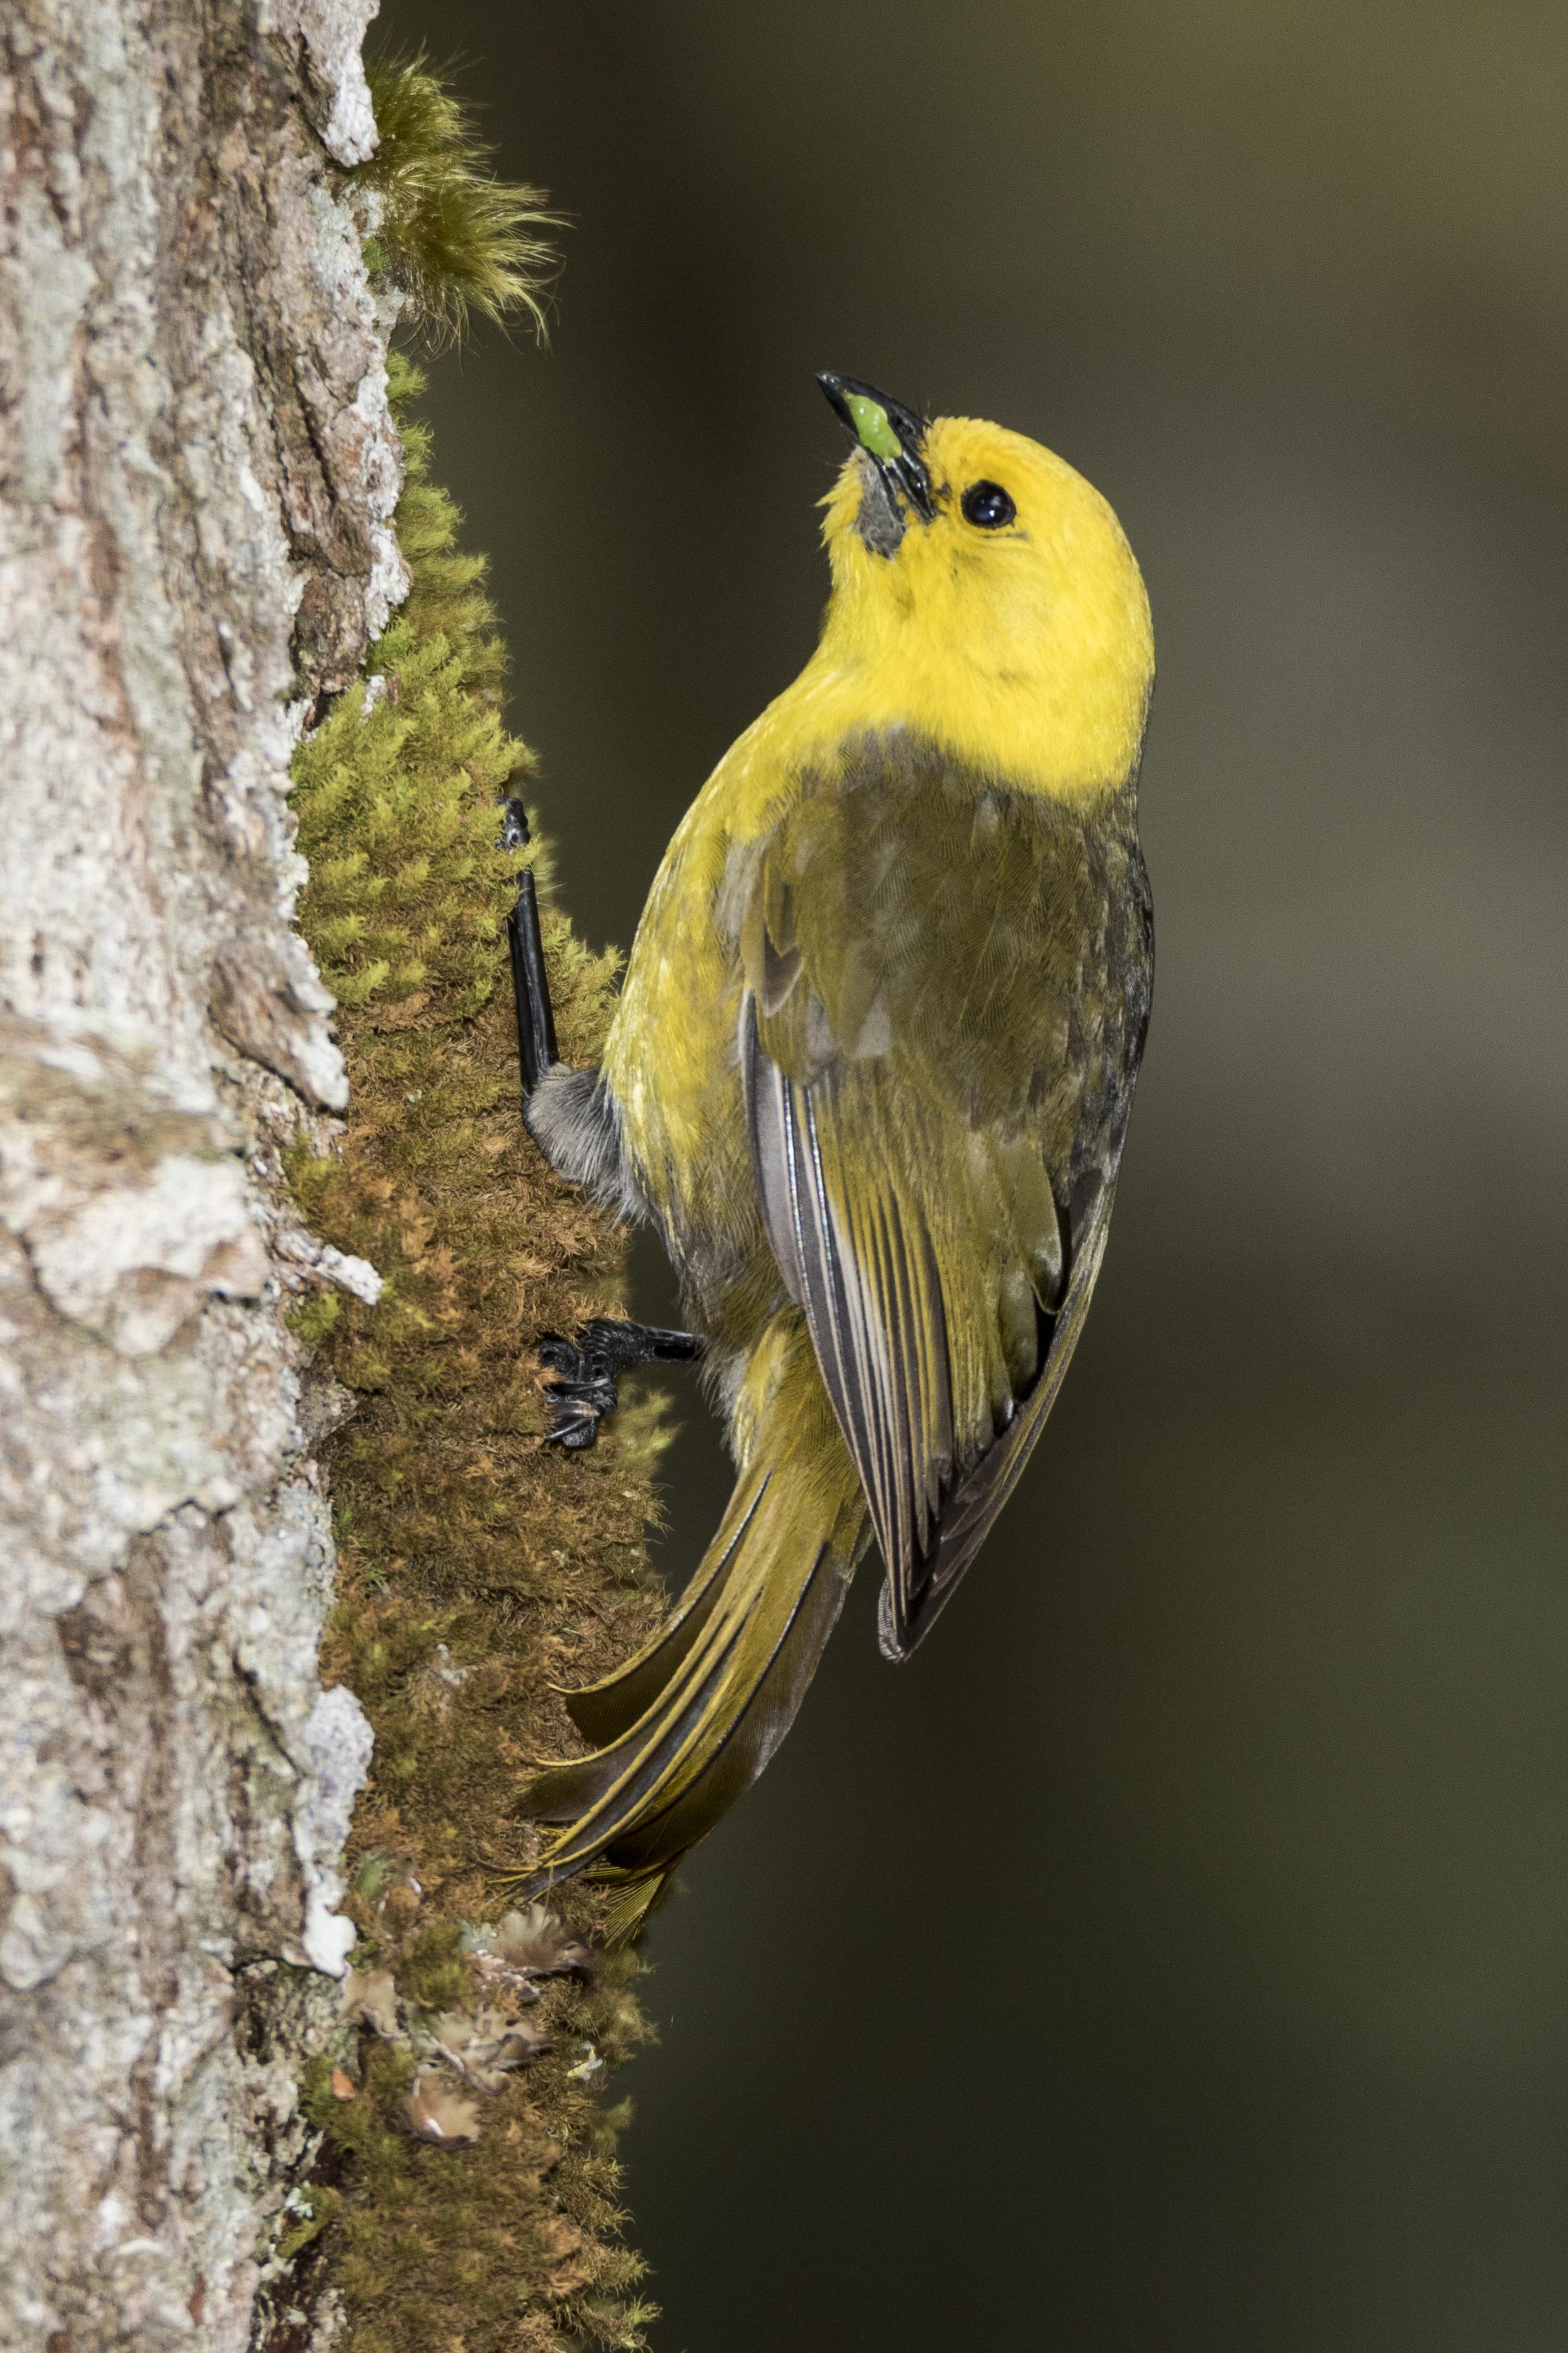 yellowhead new zealand birds online